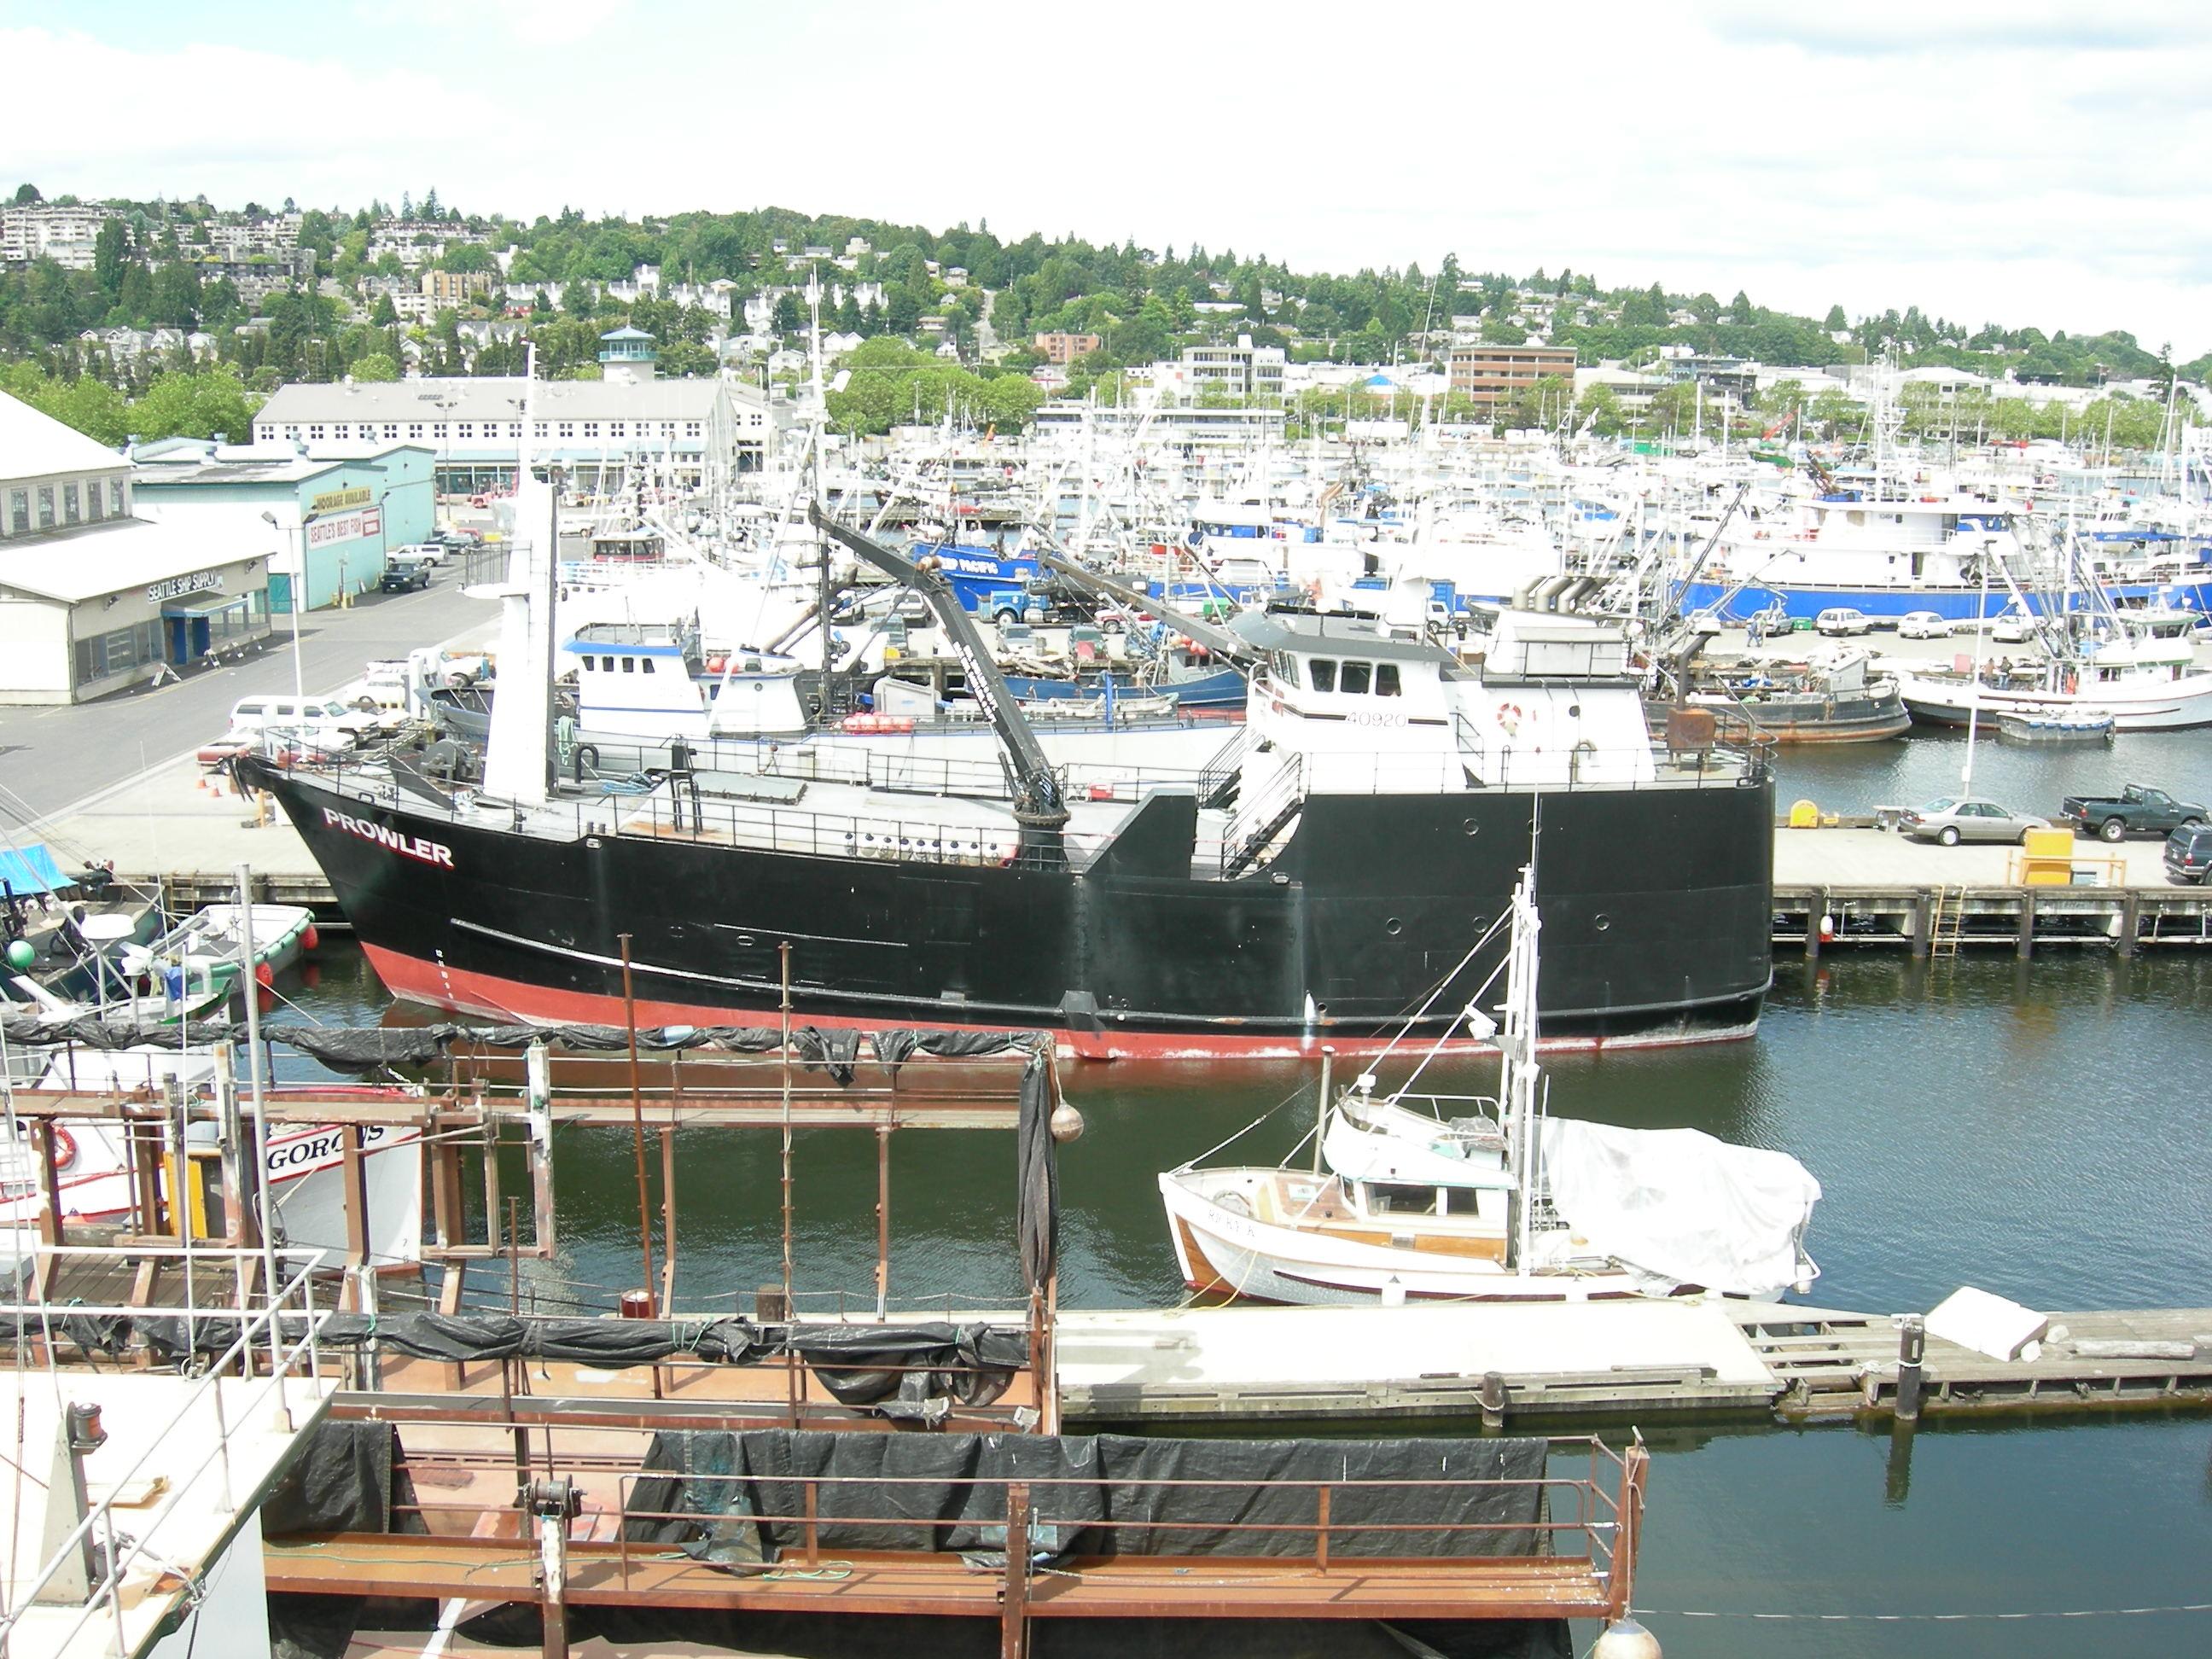 File:Fisherman's Terminal from Ballard Bridge 05 jpg - Wikimedia Commons